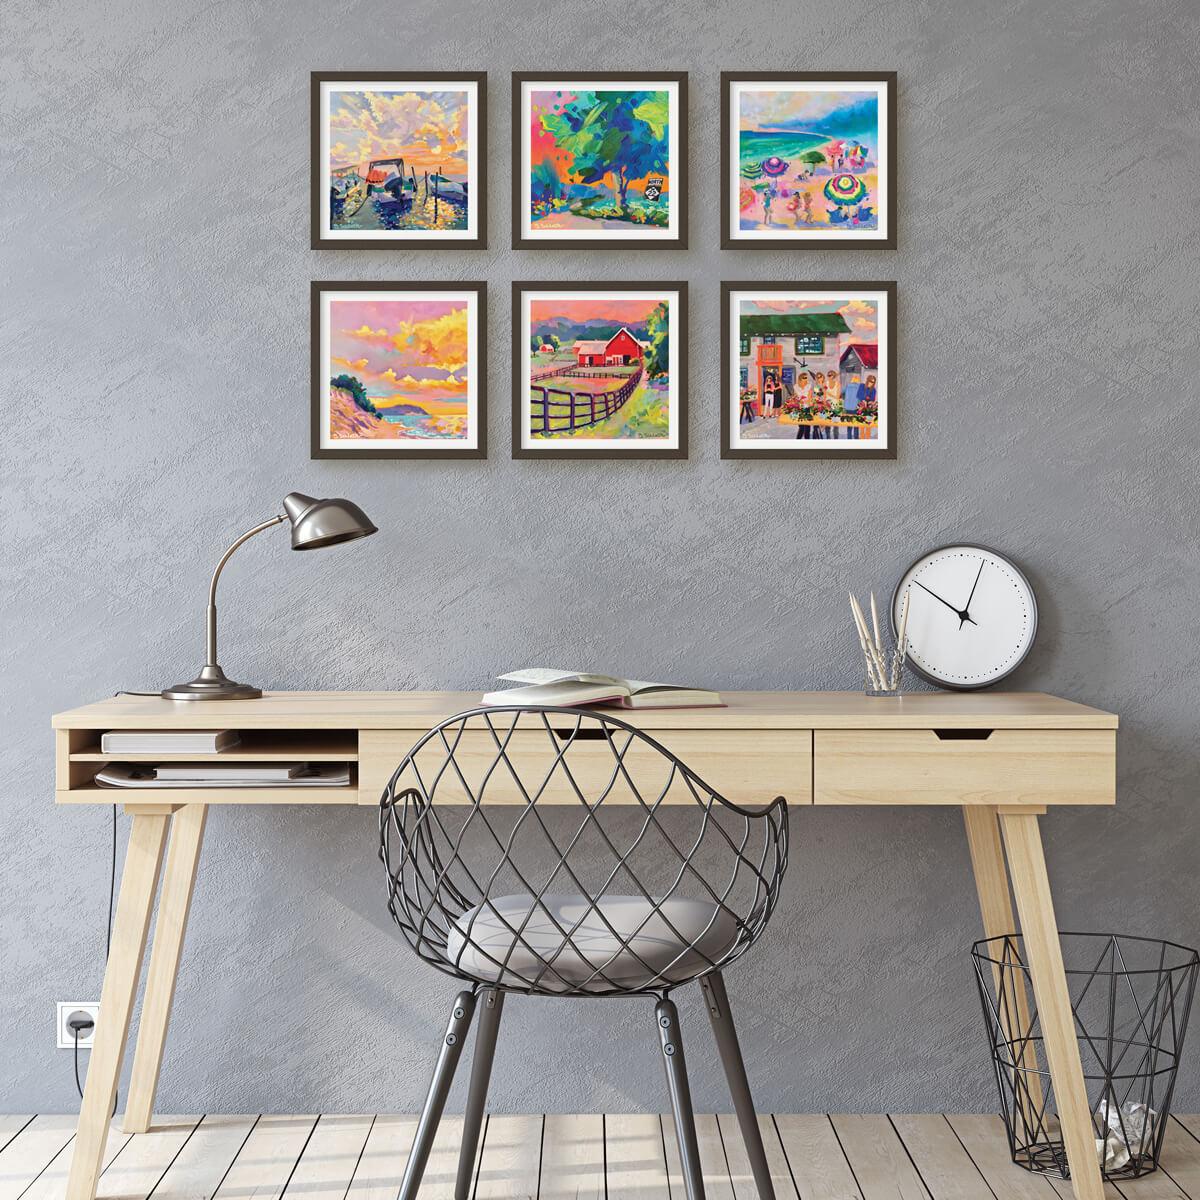 Framed calendar art examples